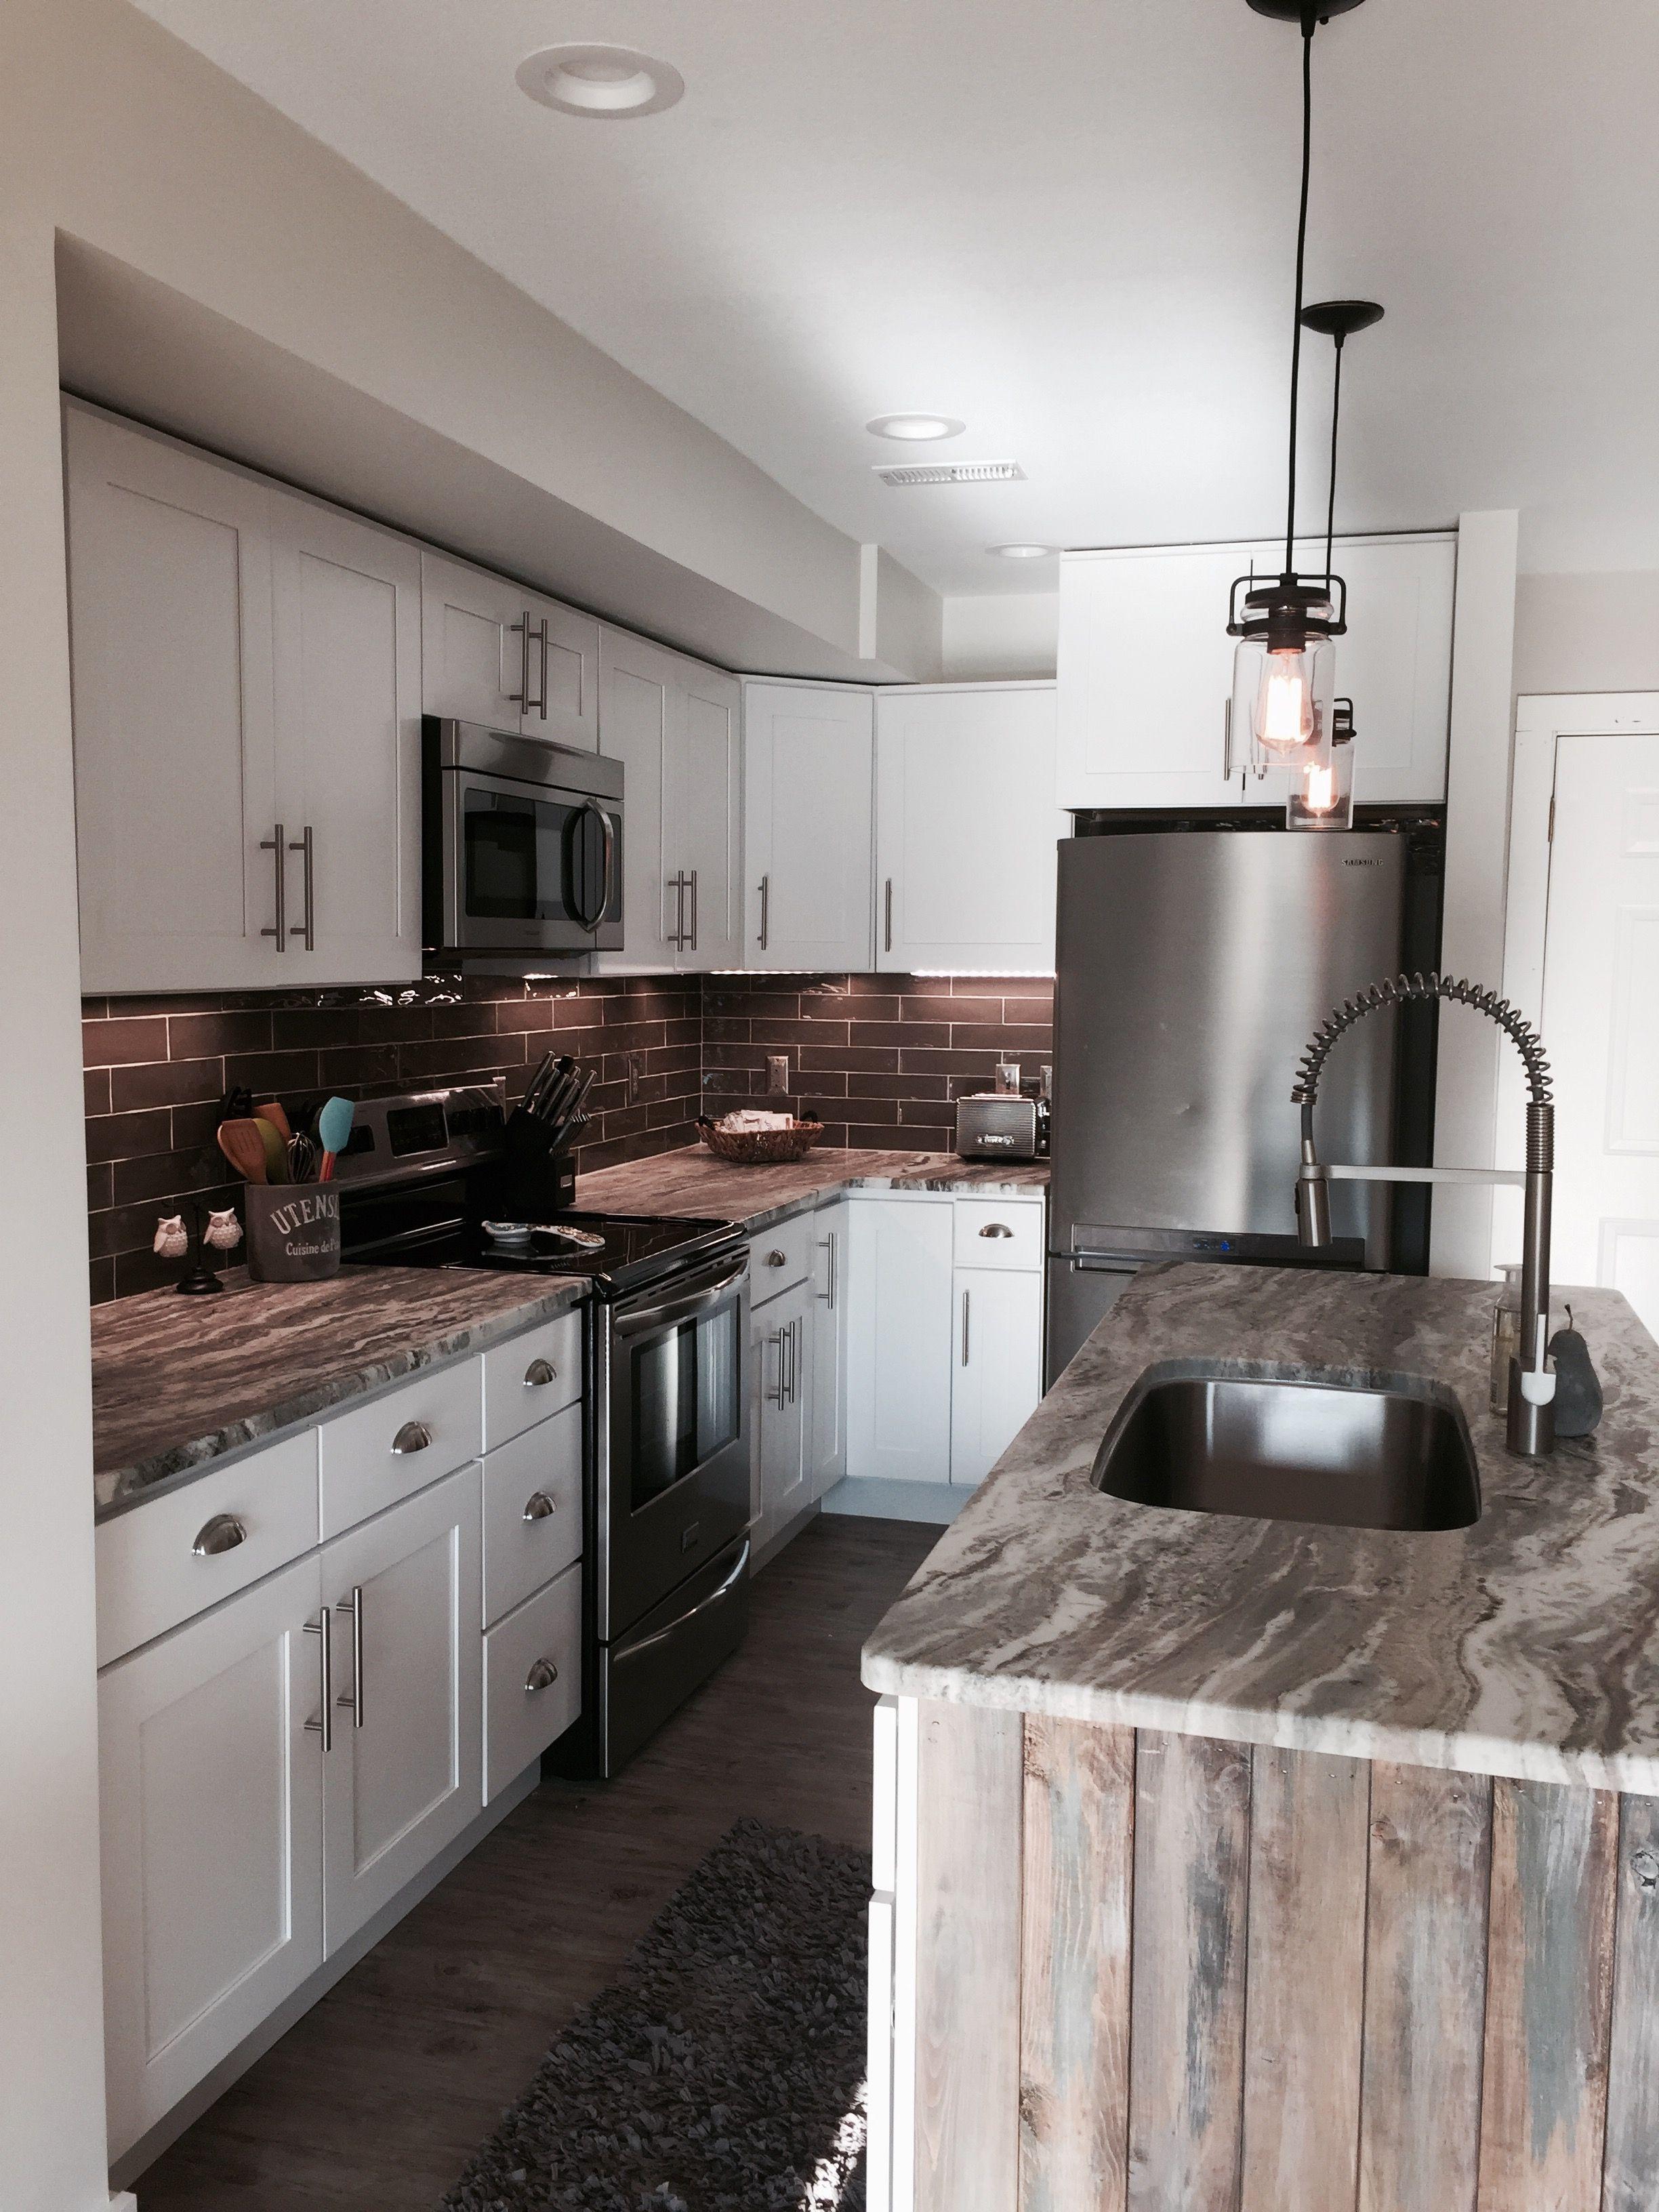 brown fantasy leathered finish granite countertops farmhouse design kitchen cabinets on farmhouse kitchen granite countertops id=44055